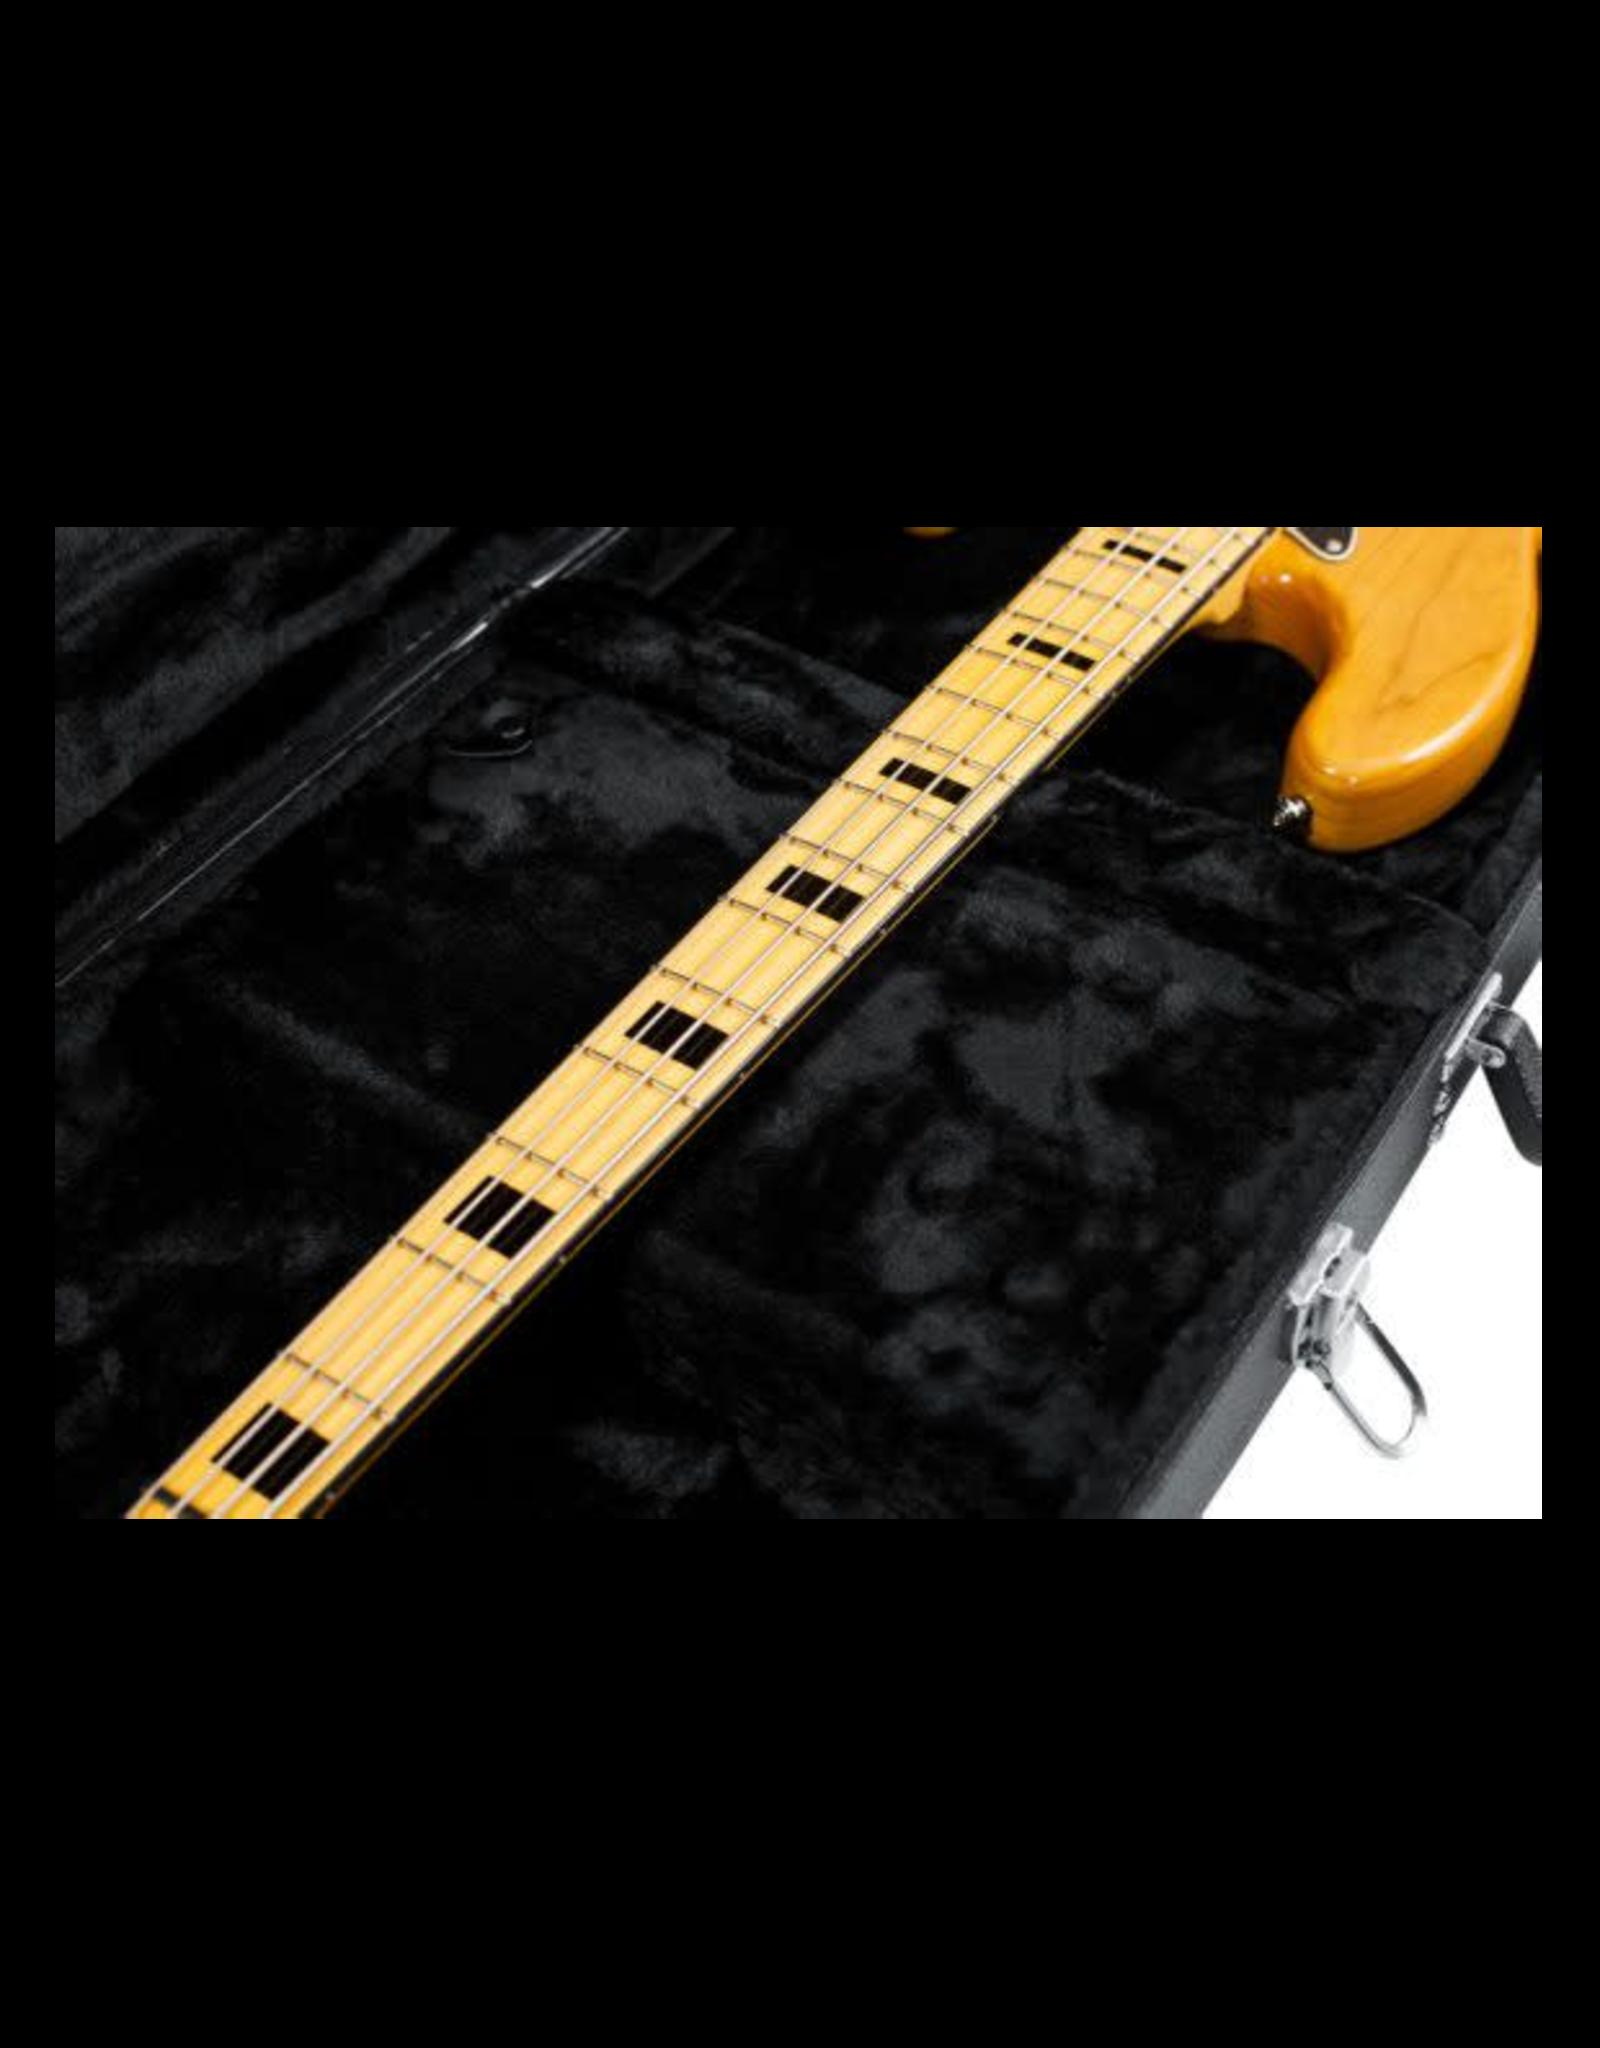 Gator Gator GWE SERIES Bass Guitar Case